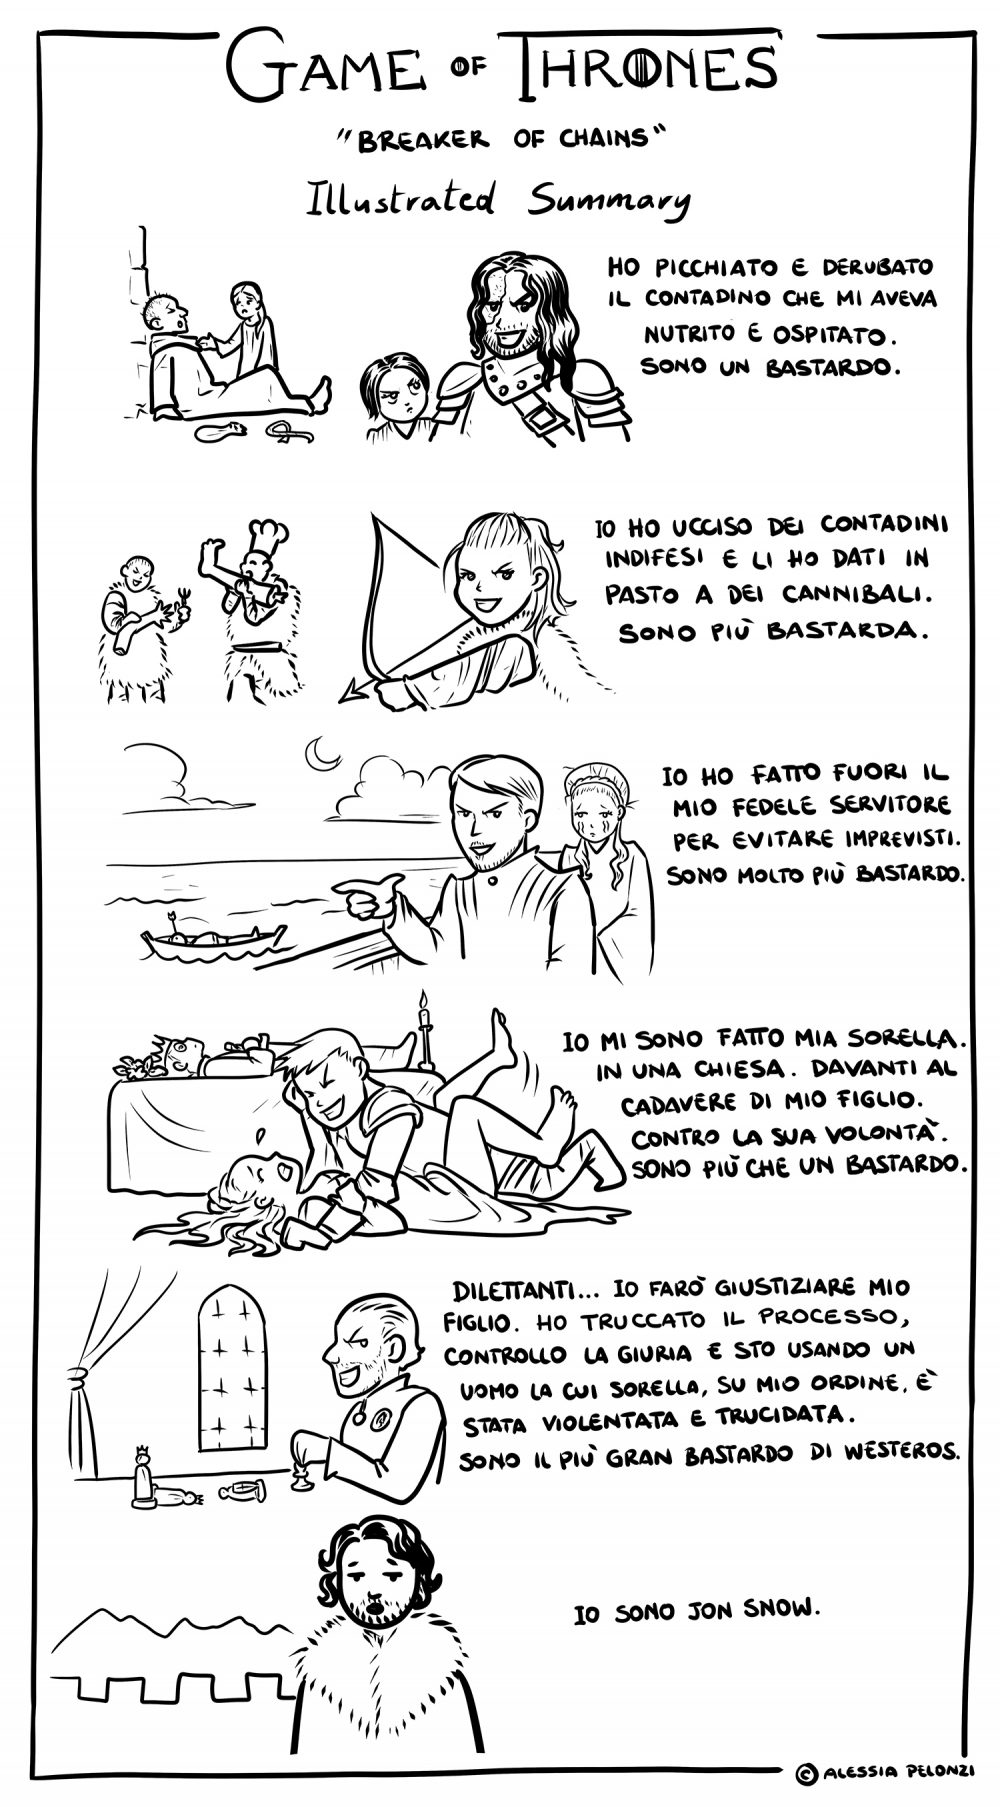 game of thrones - breaker of chains - riassunto illustrato